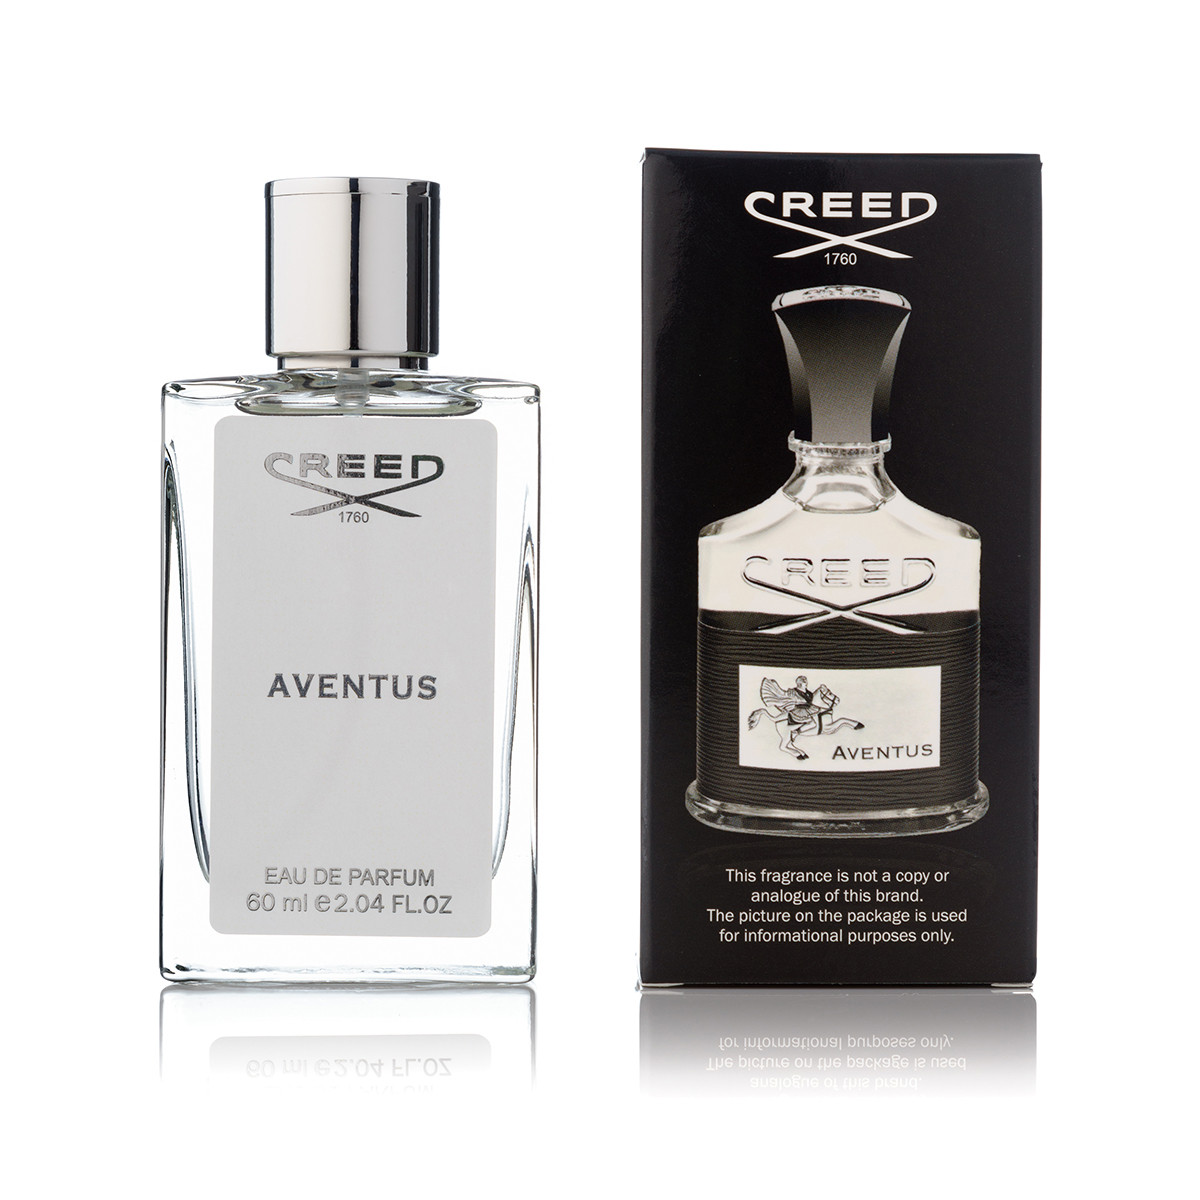 Мужская парфюмерия Creed Aventus (крид авентус) тестер 60 ml (реплика)